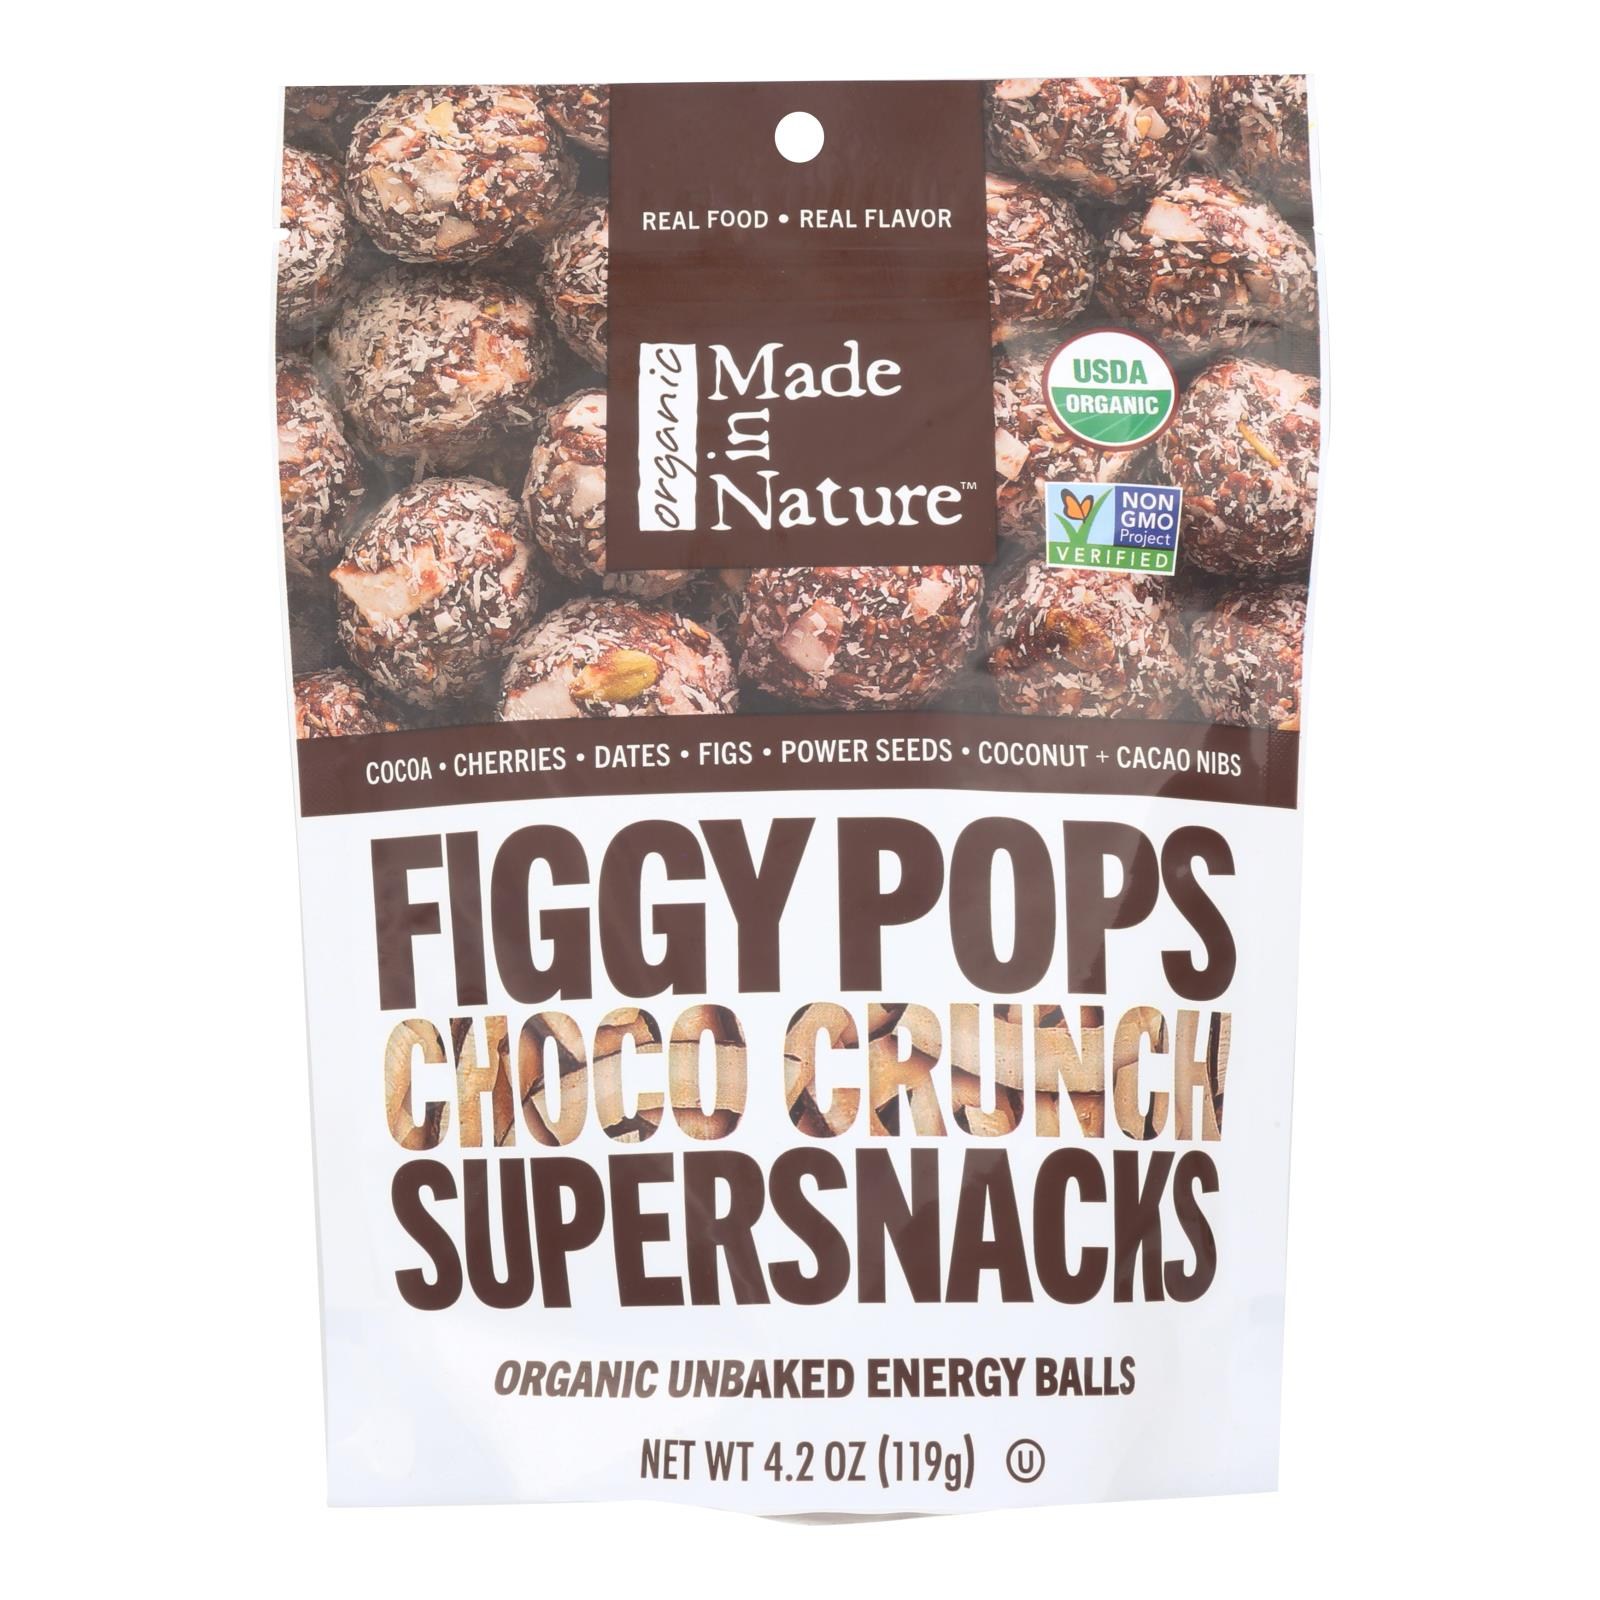 Made in Nature Figgy Pops - Choco Crunch - Case of 6 - 4.2 oz